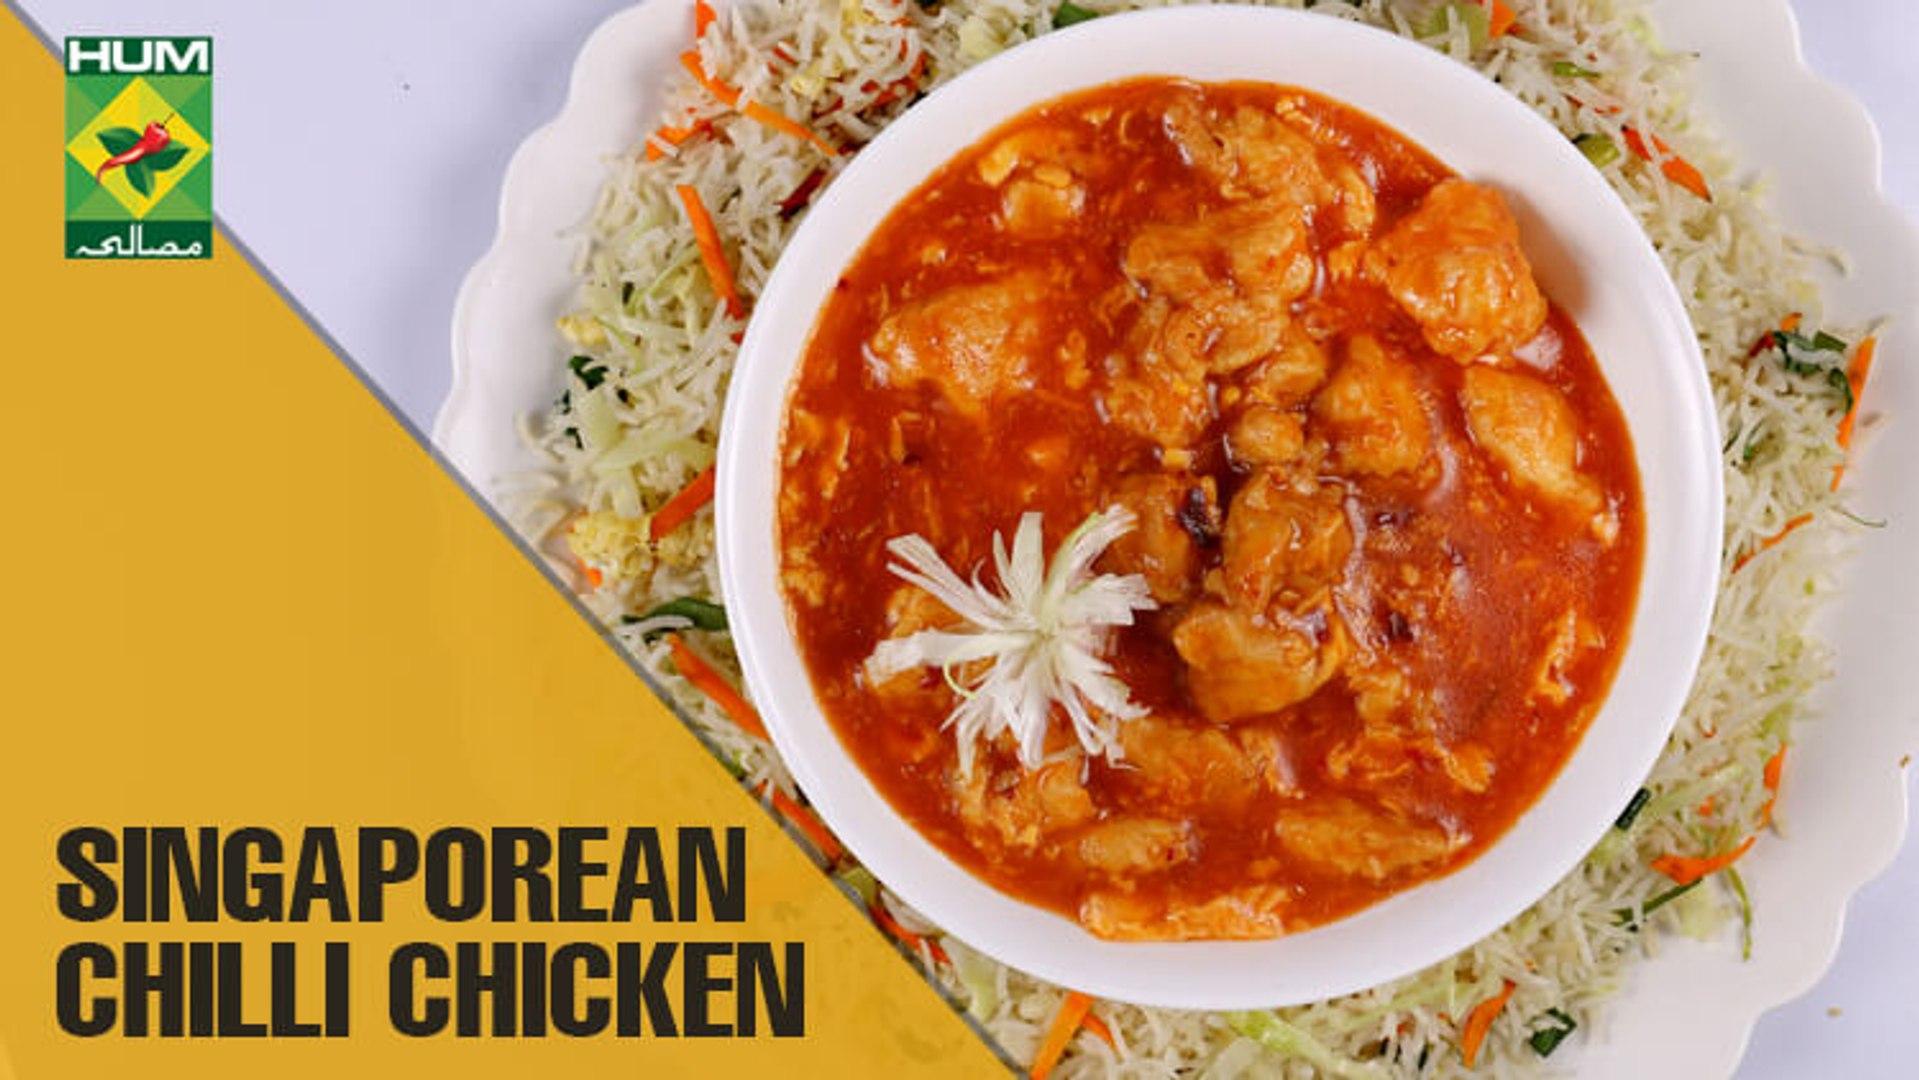 Singaporean chilli chicken Samina Jalil